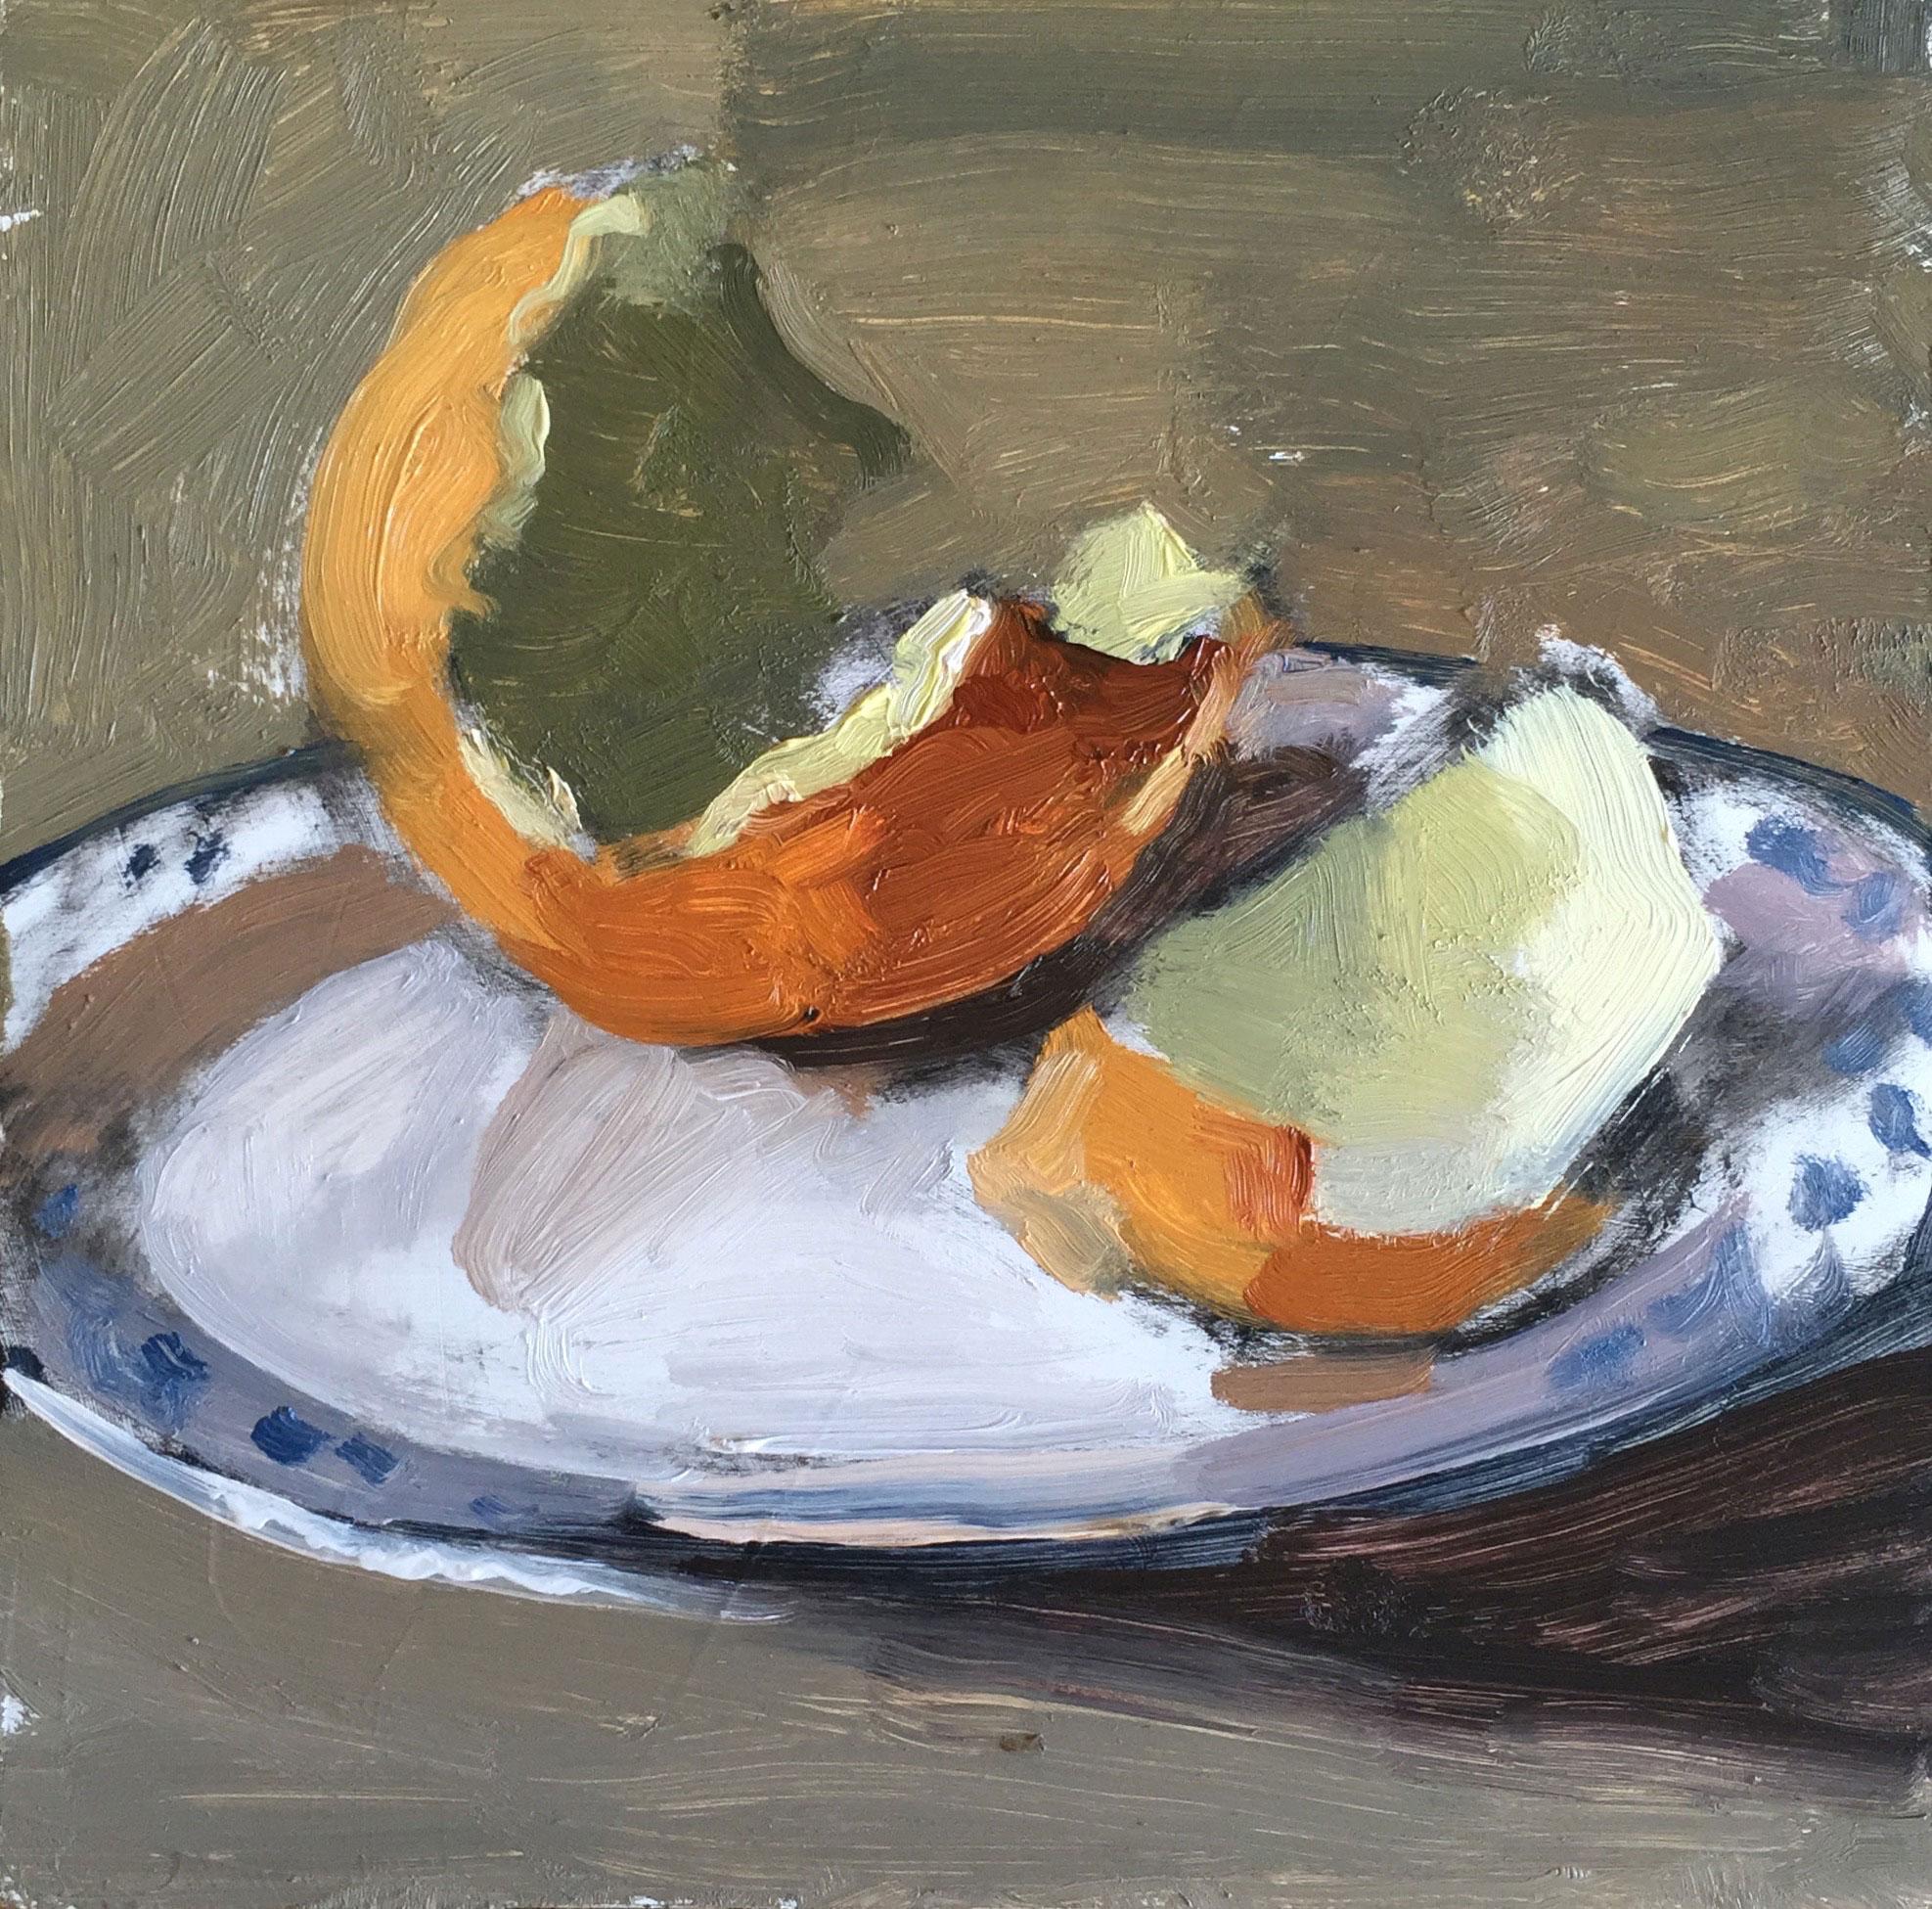 mark-crenshaw-1612pa-orange-peel-on-white_blue-plate-a.jpg